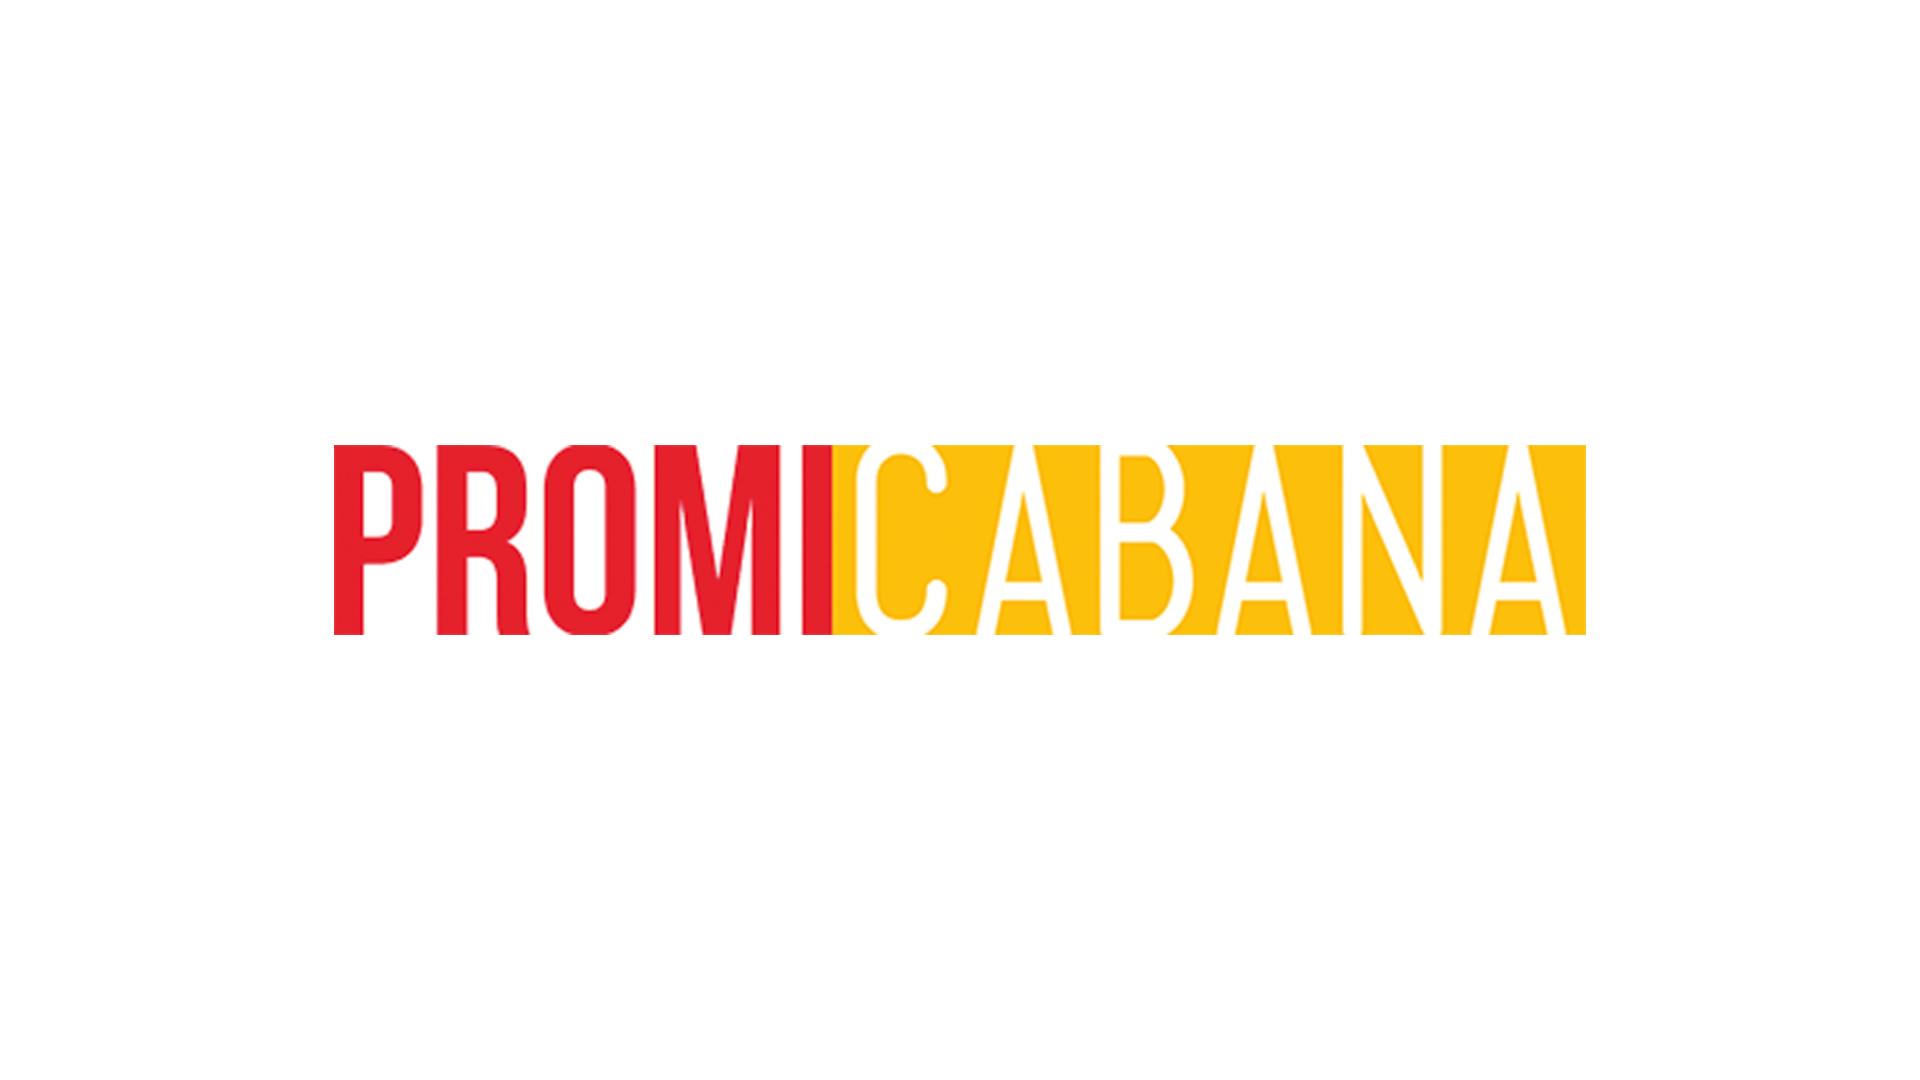 Robert-Downey-Jr-Tony-Stark-Shirt